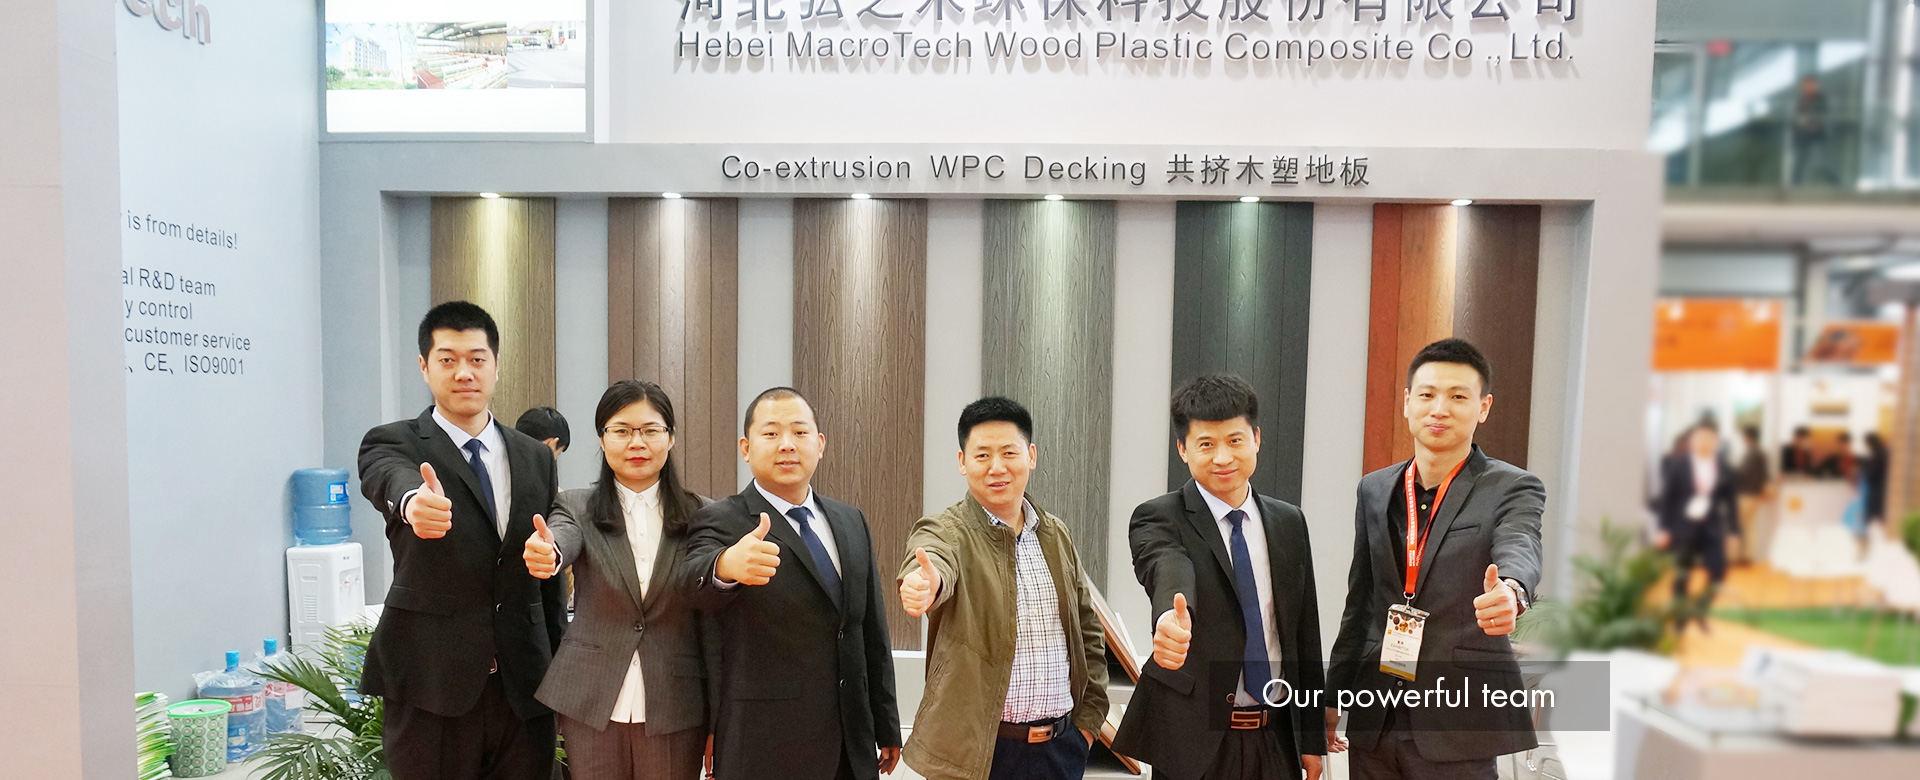 Hebei MacroTech Wood Plastic Composite Co., Ltd.